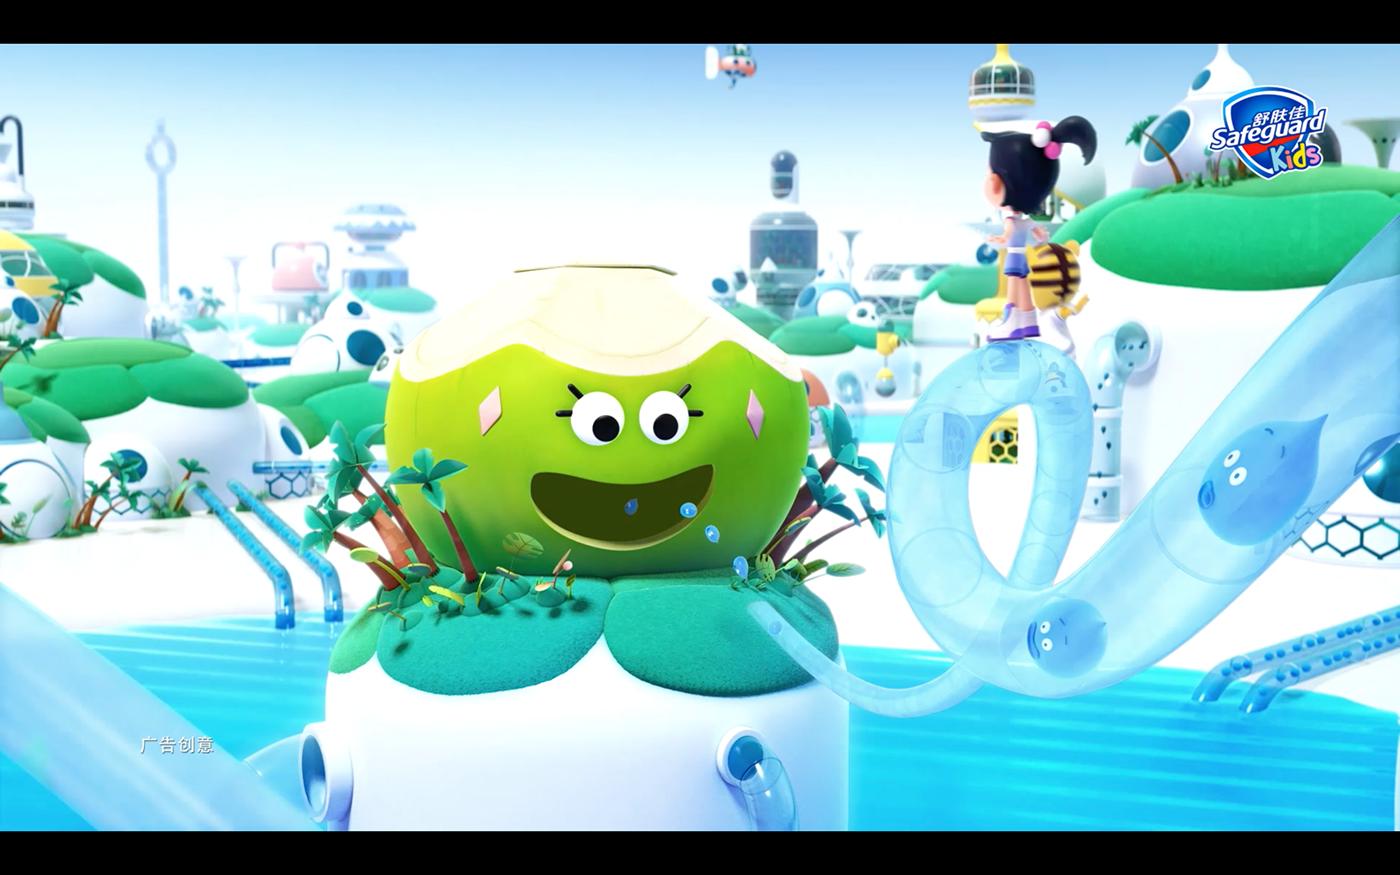 PROCTER & GAMBLE p&G china shimajiro qiao hu animation  London FeedMeLight Saatchi singapore